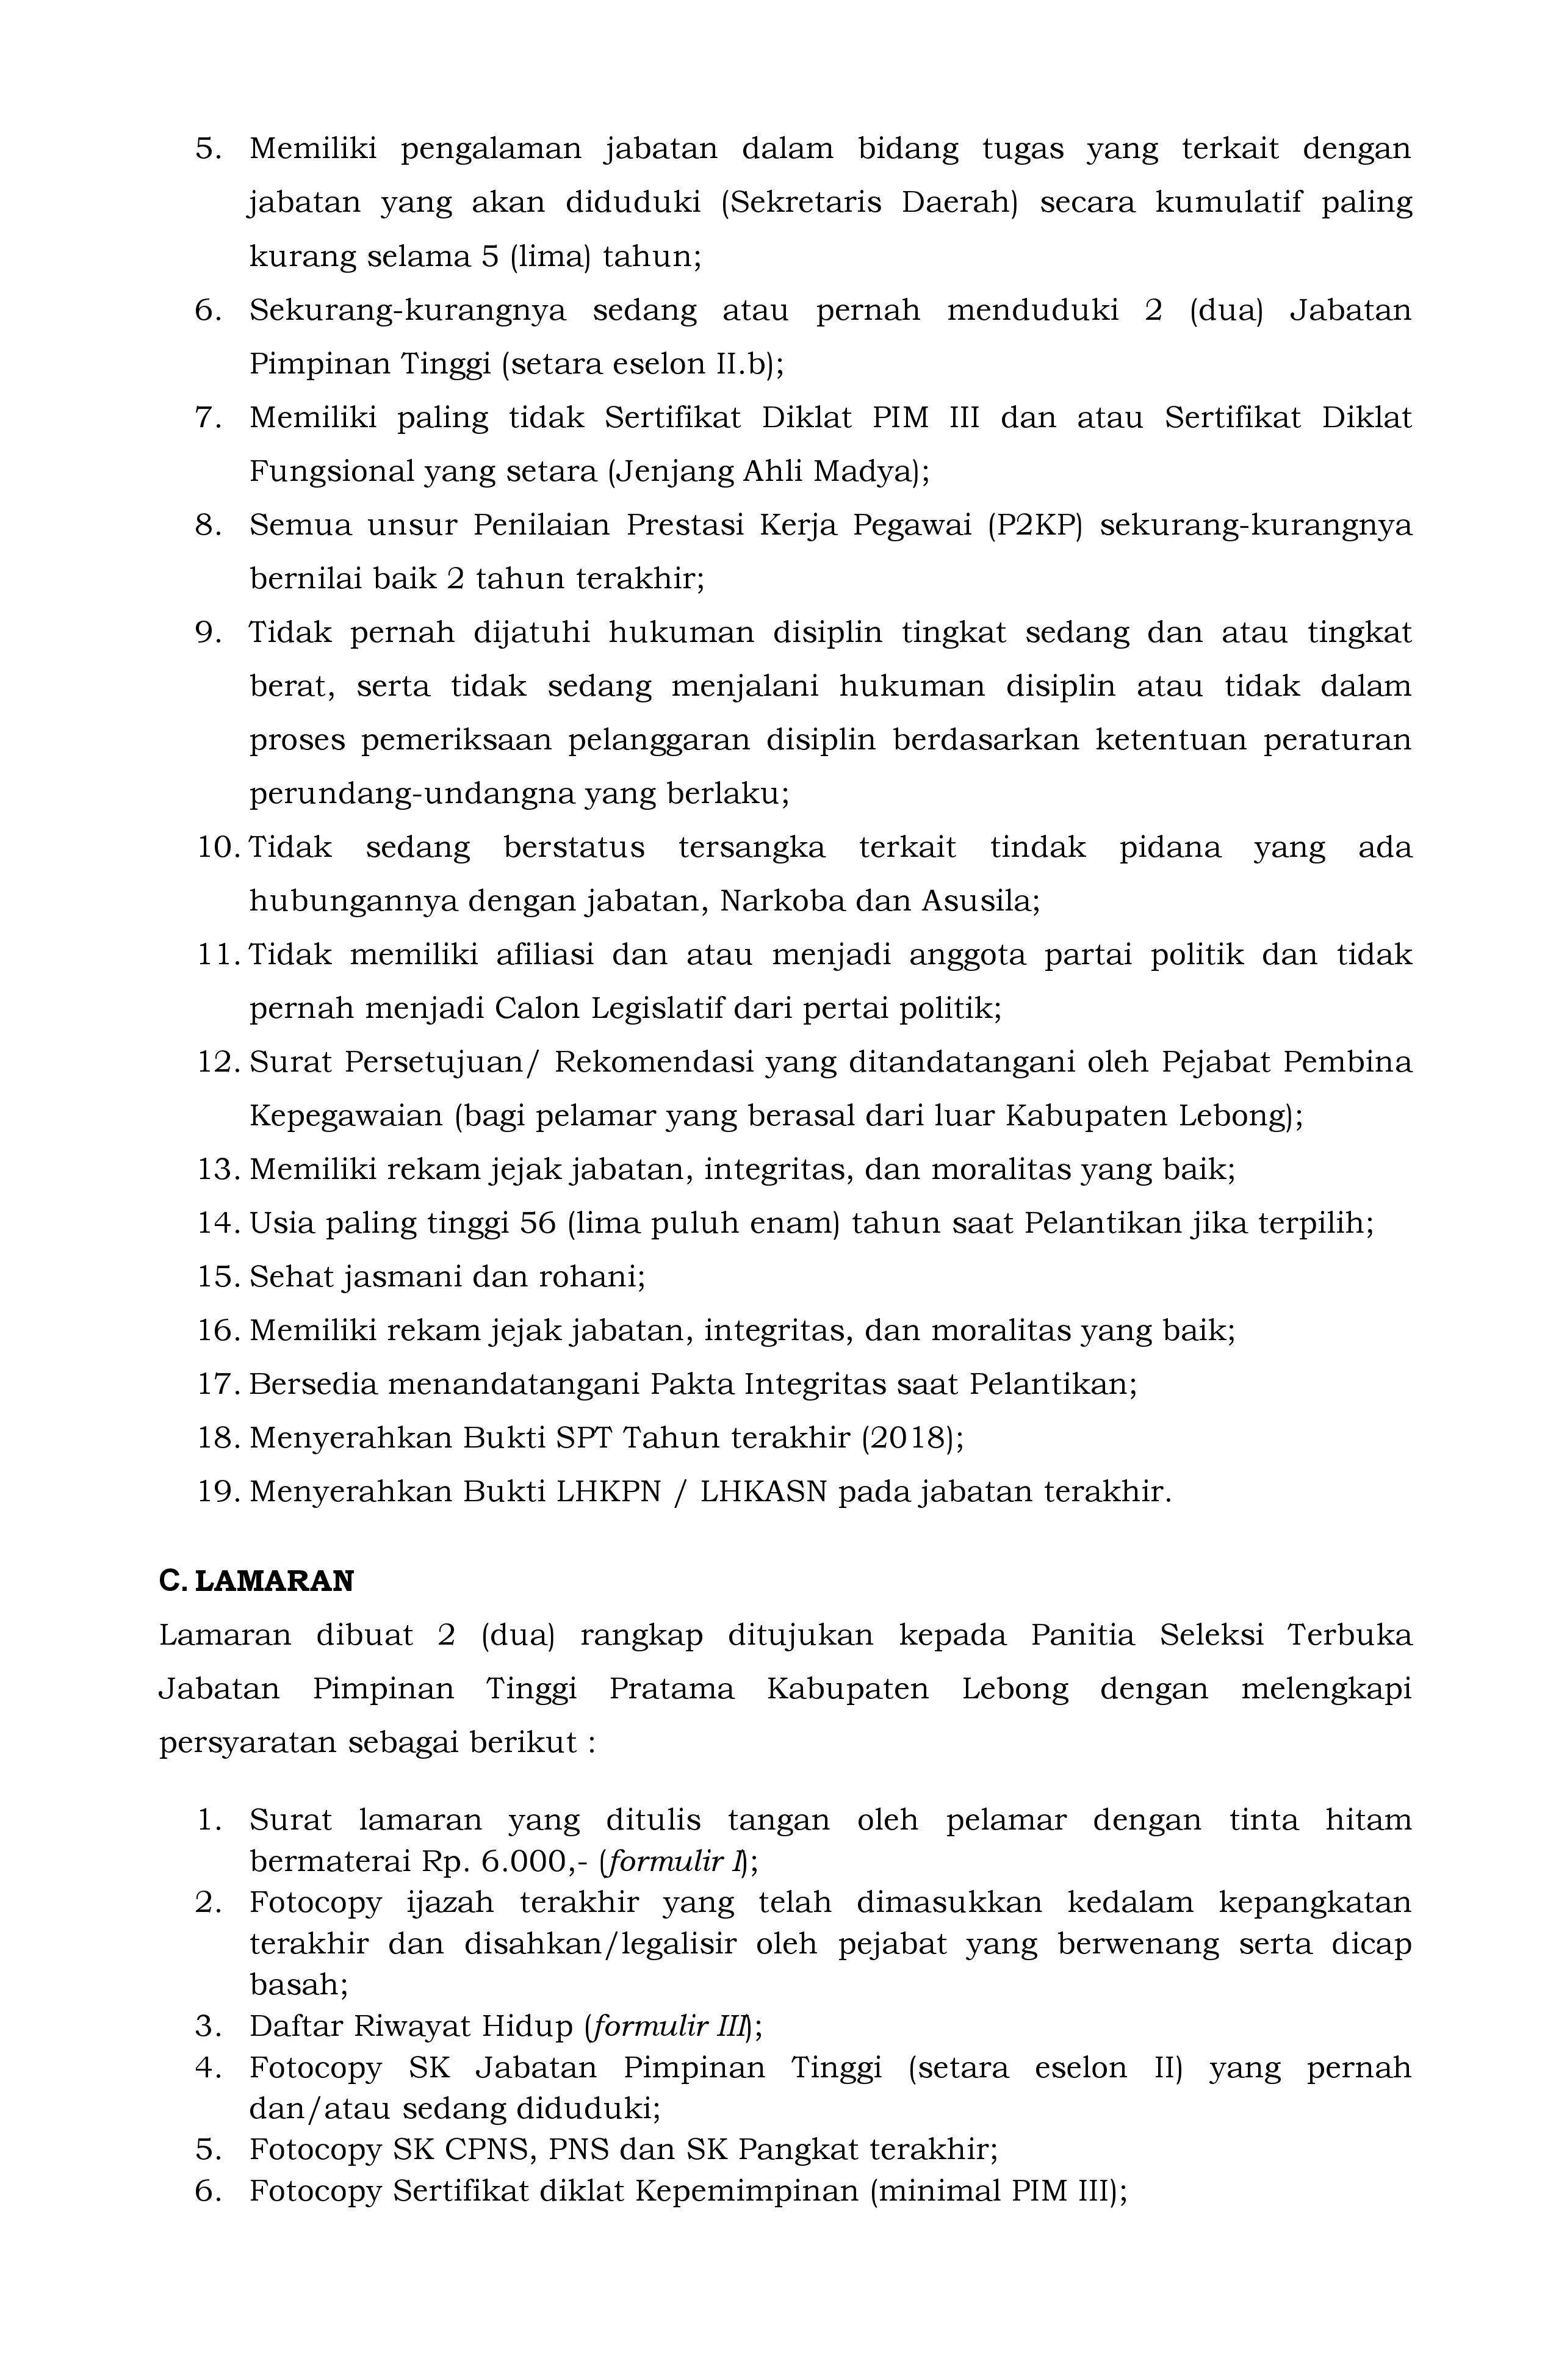 https://bkpsdm.lebongkab.go.id/an-component/media/upload-gambar-pendukung/JPT/0002.jpg